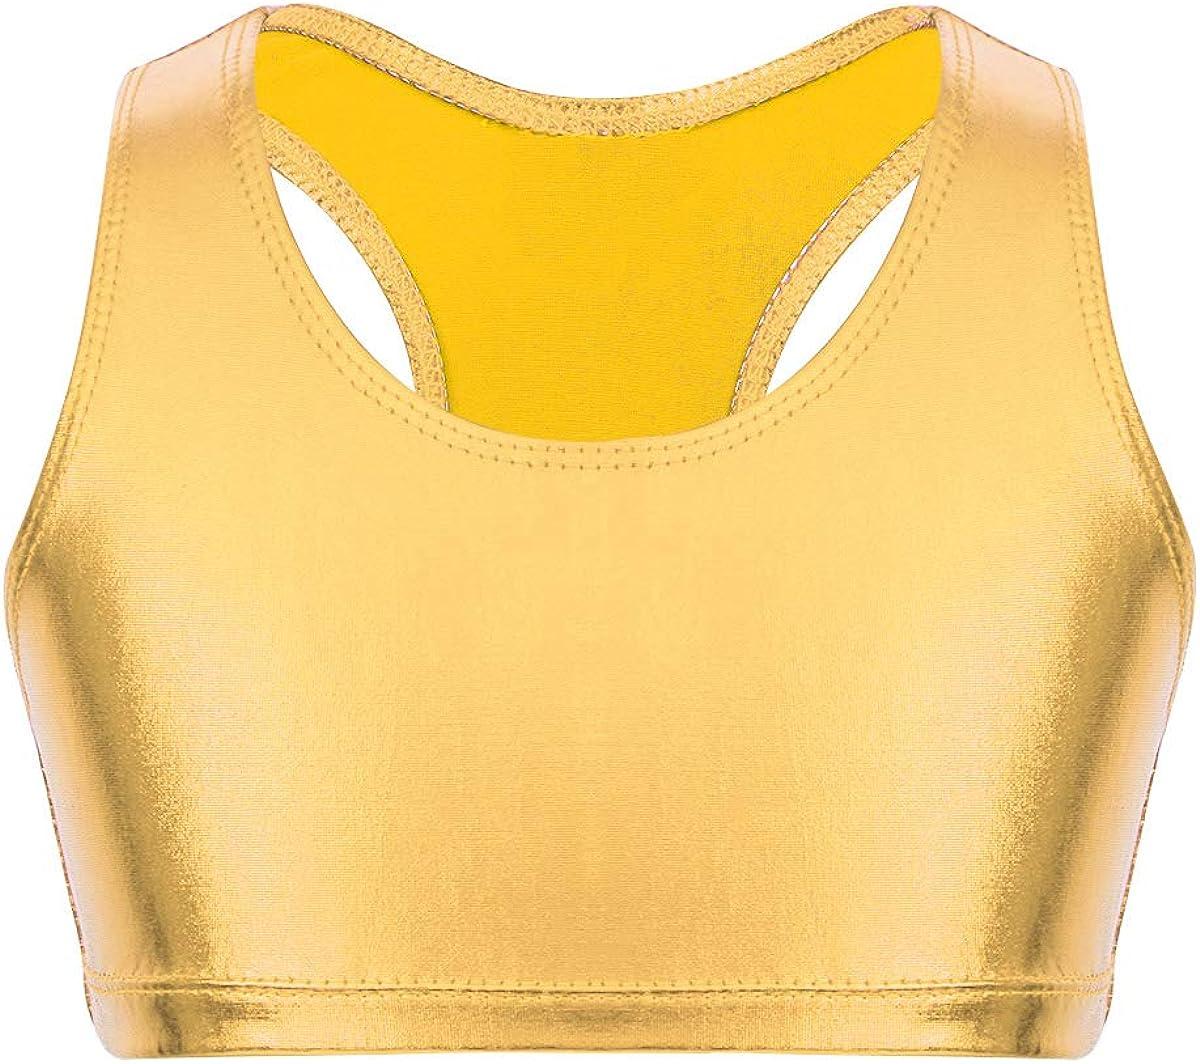 moily Big Girls Metallic Racer Back Crop Top Sports Bra for Gymnastics/Dance/Workout Camisole